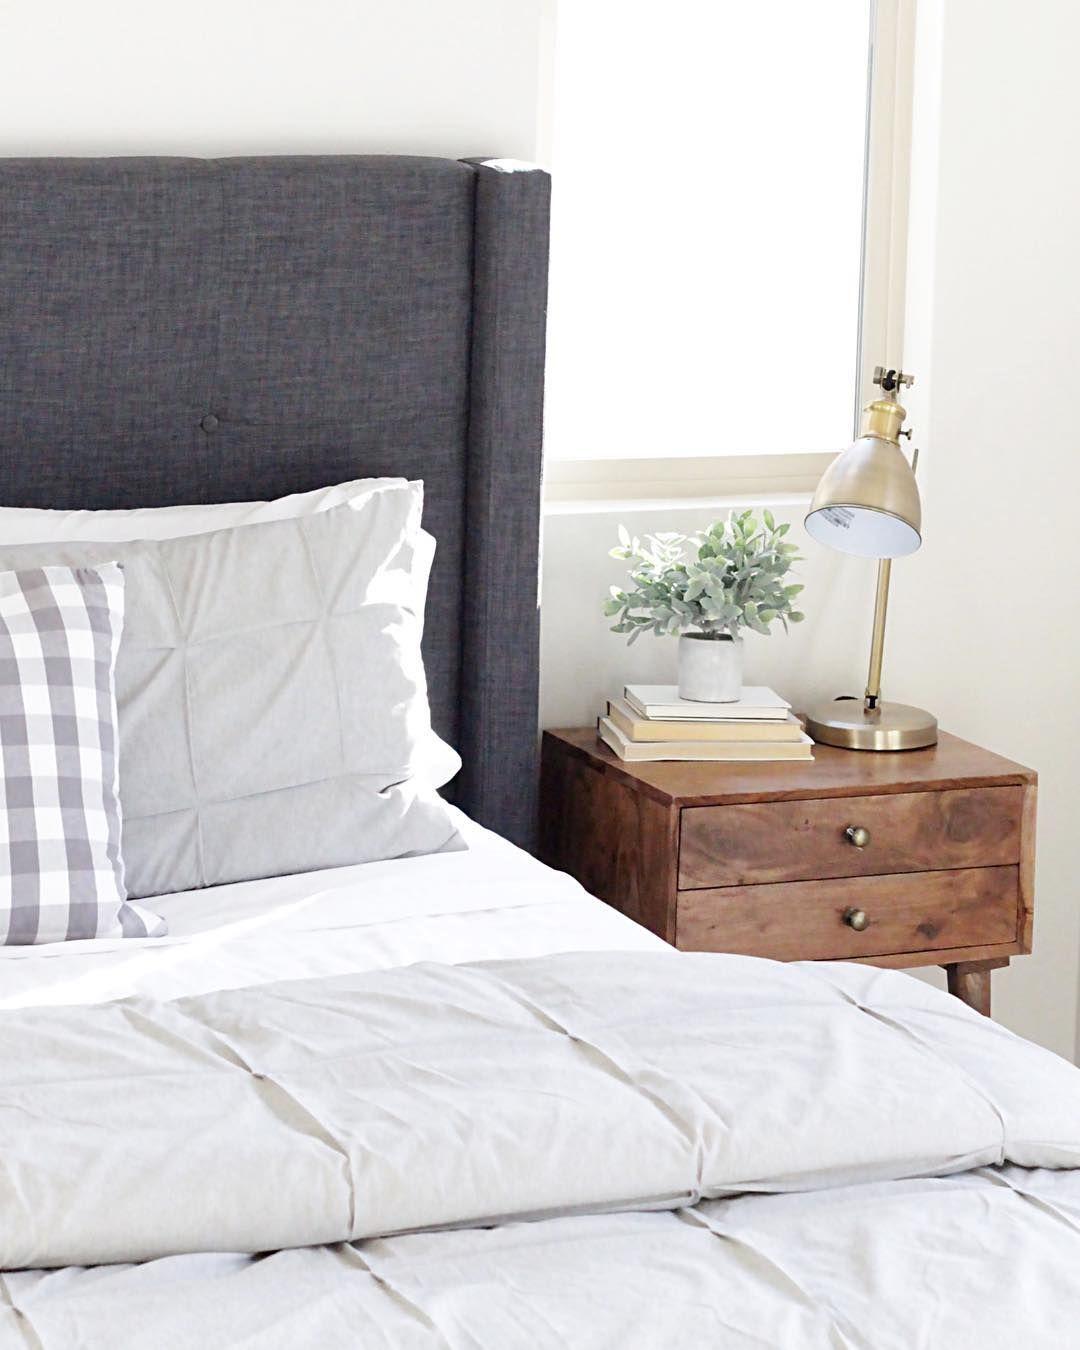 Damon Charcoal Queen Upholstered Platform Bed Upholstered